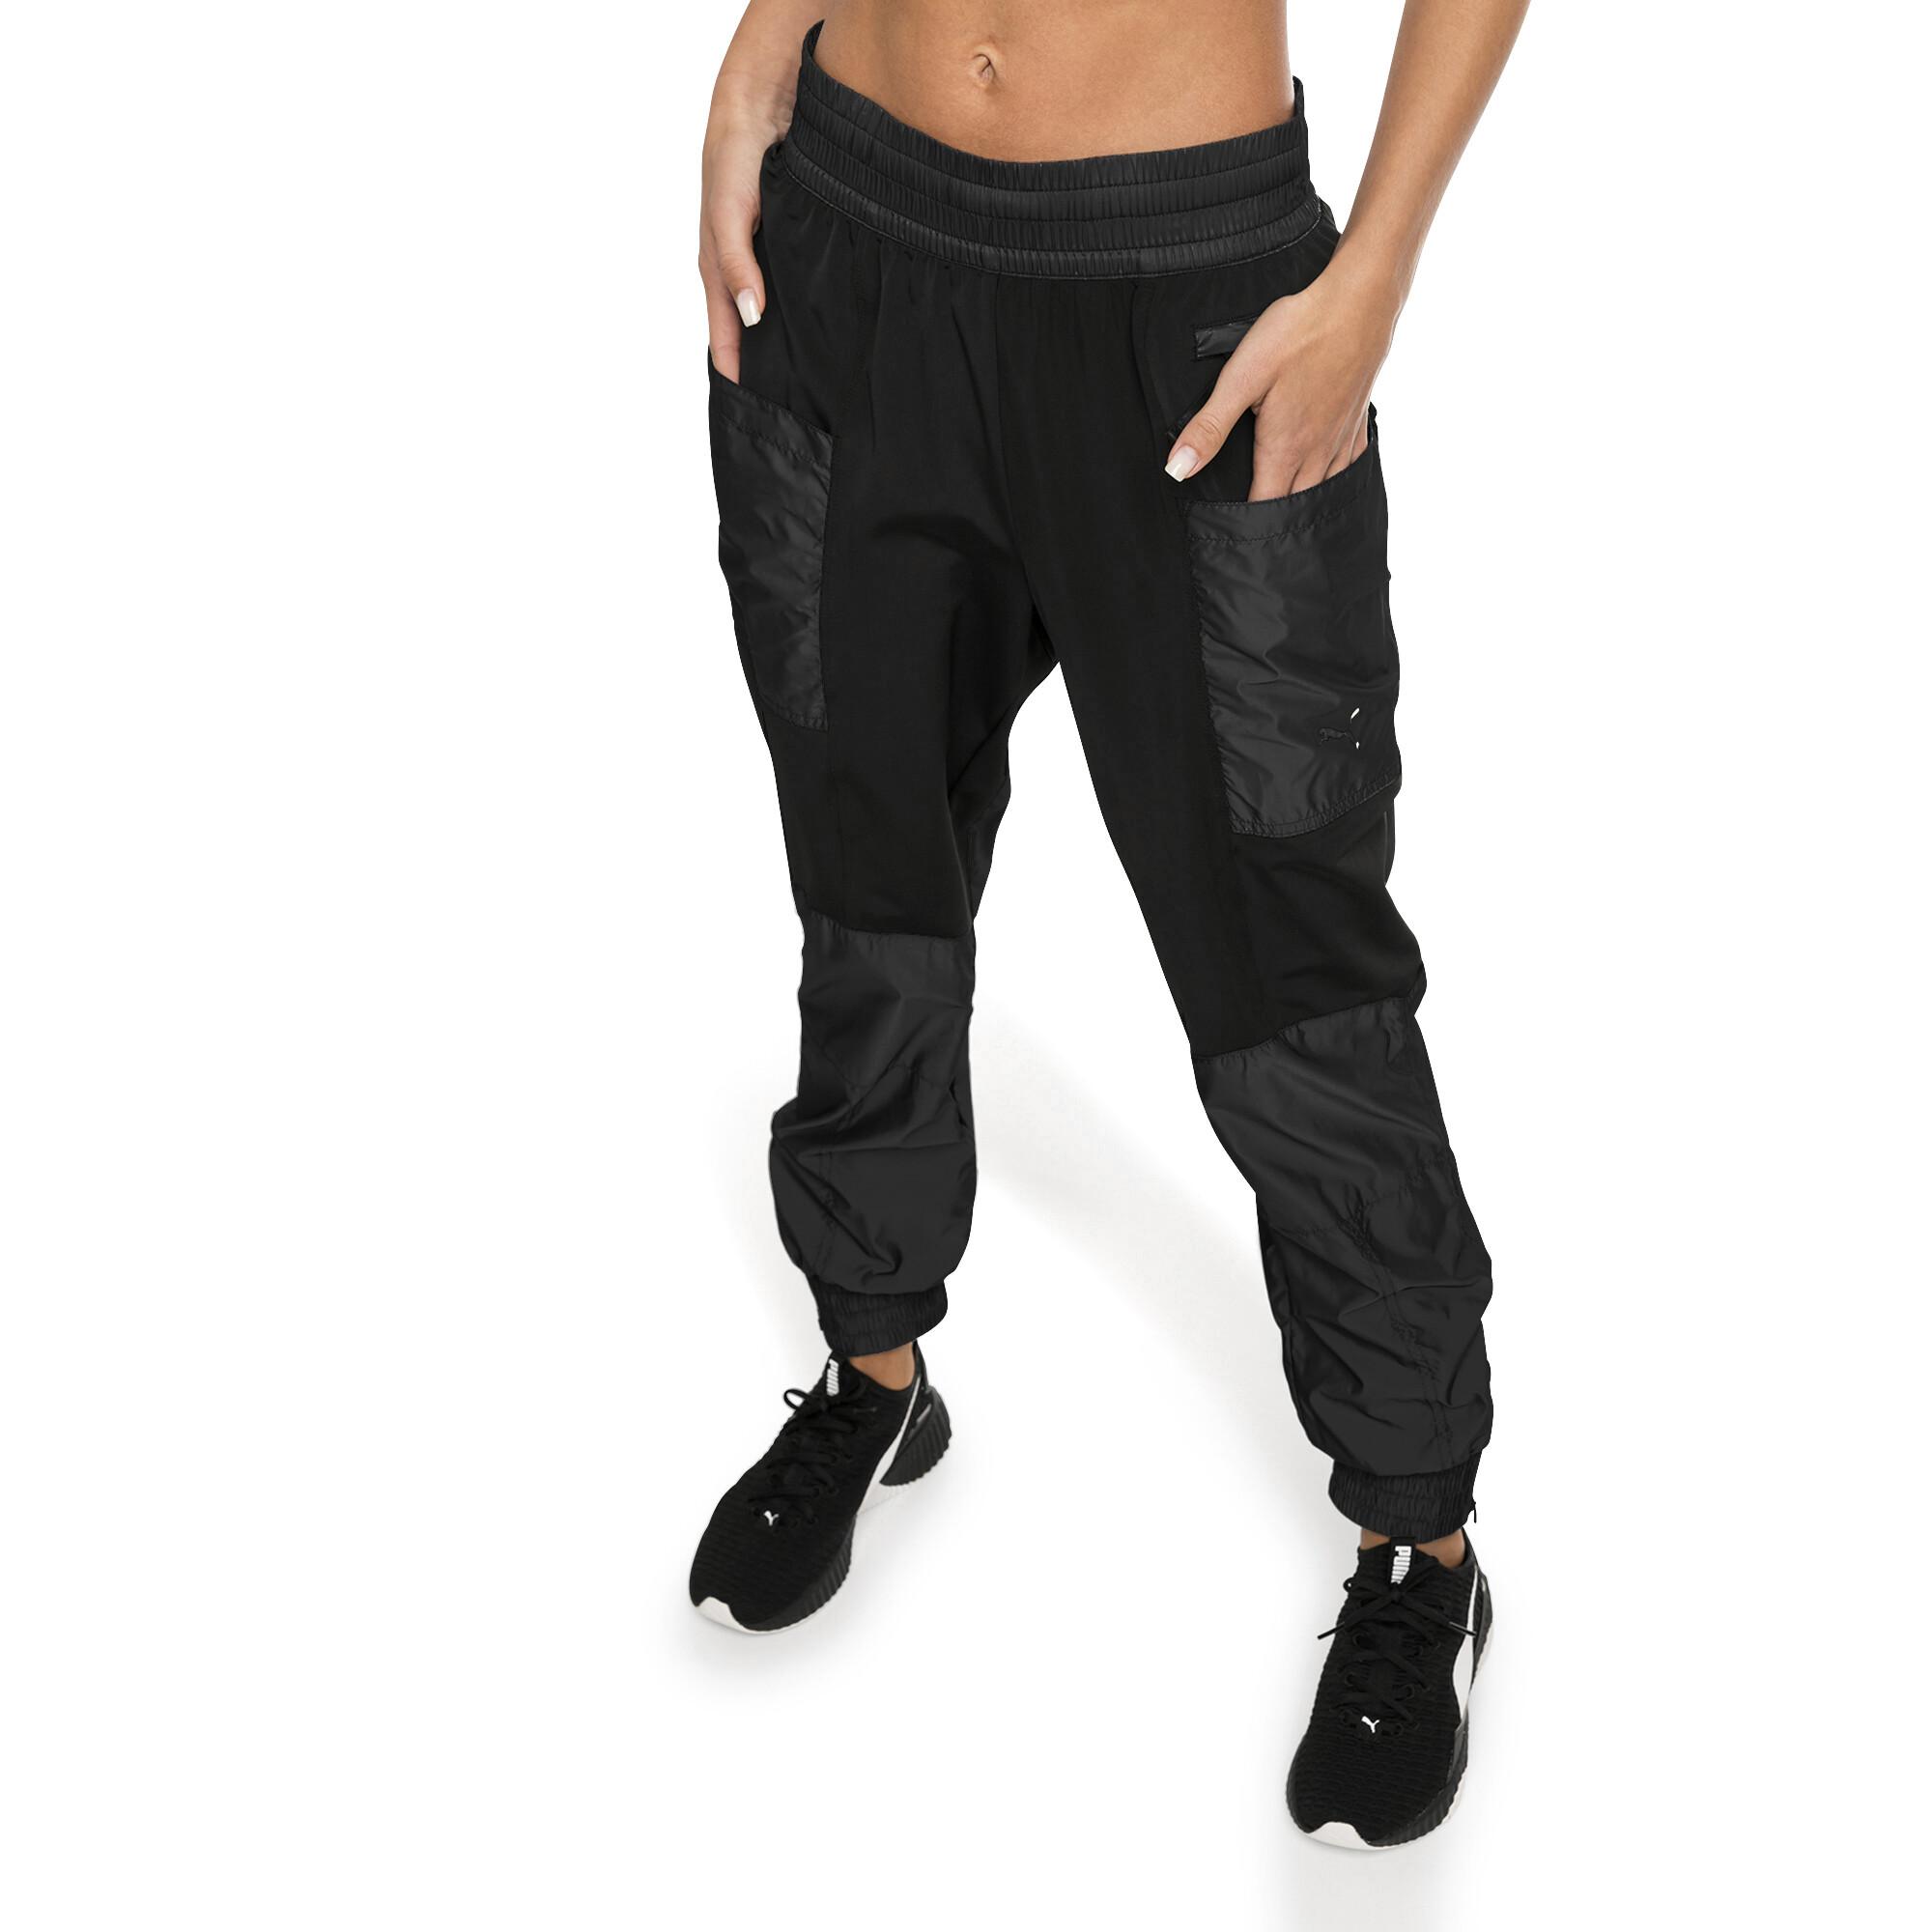 Image Puma Cosmic Knitted Women's Training Pants #1